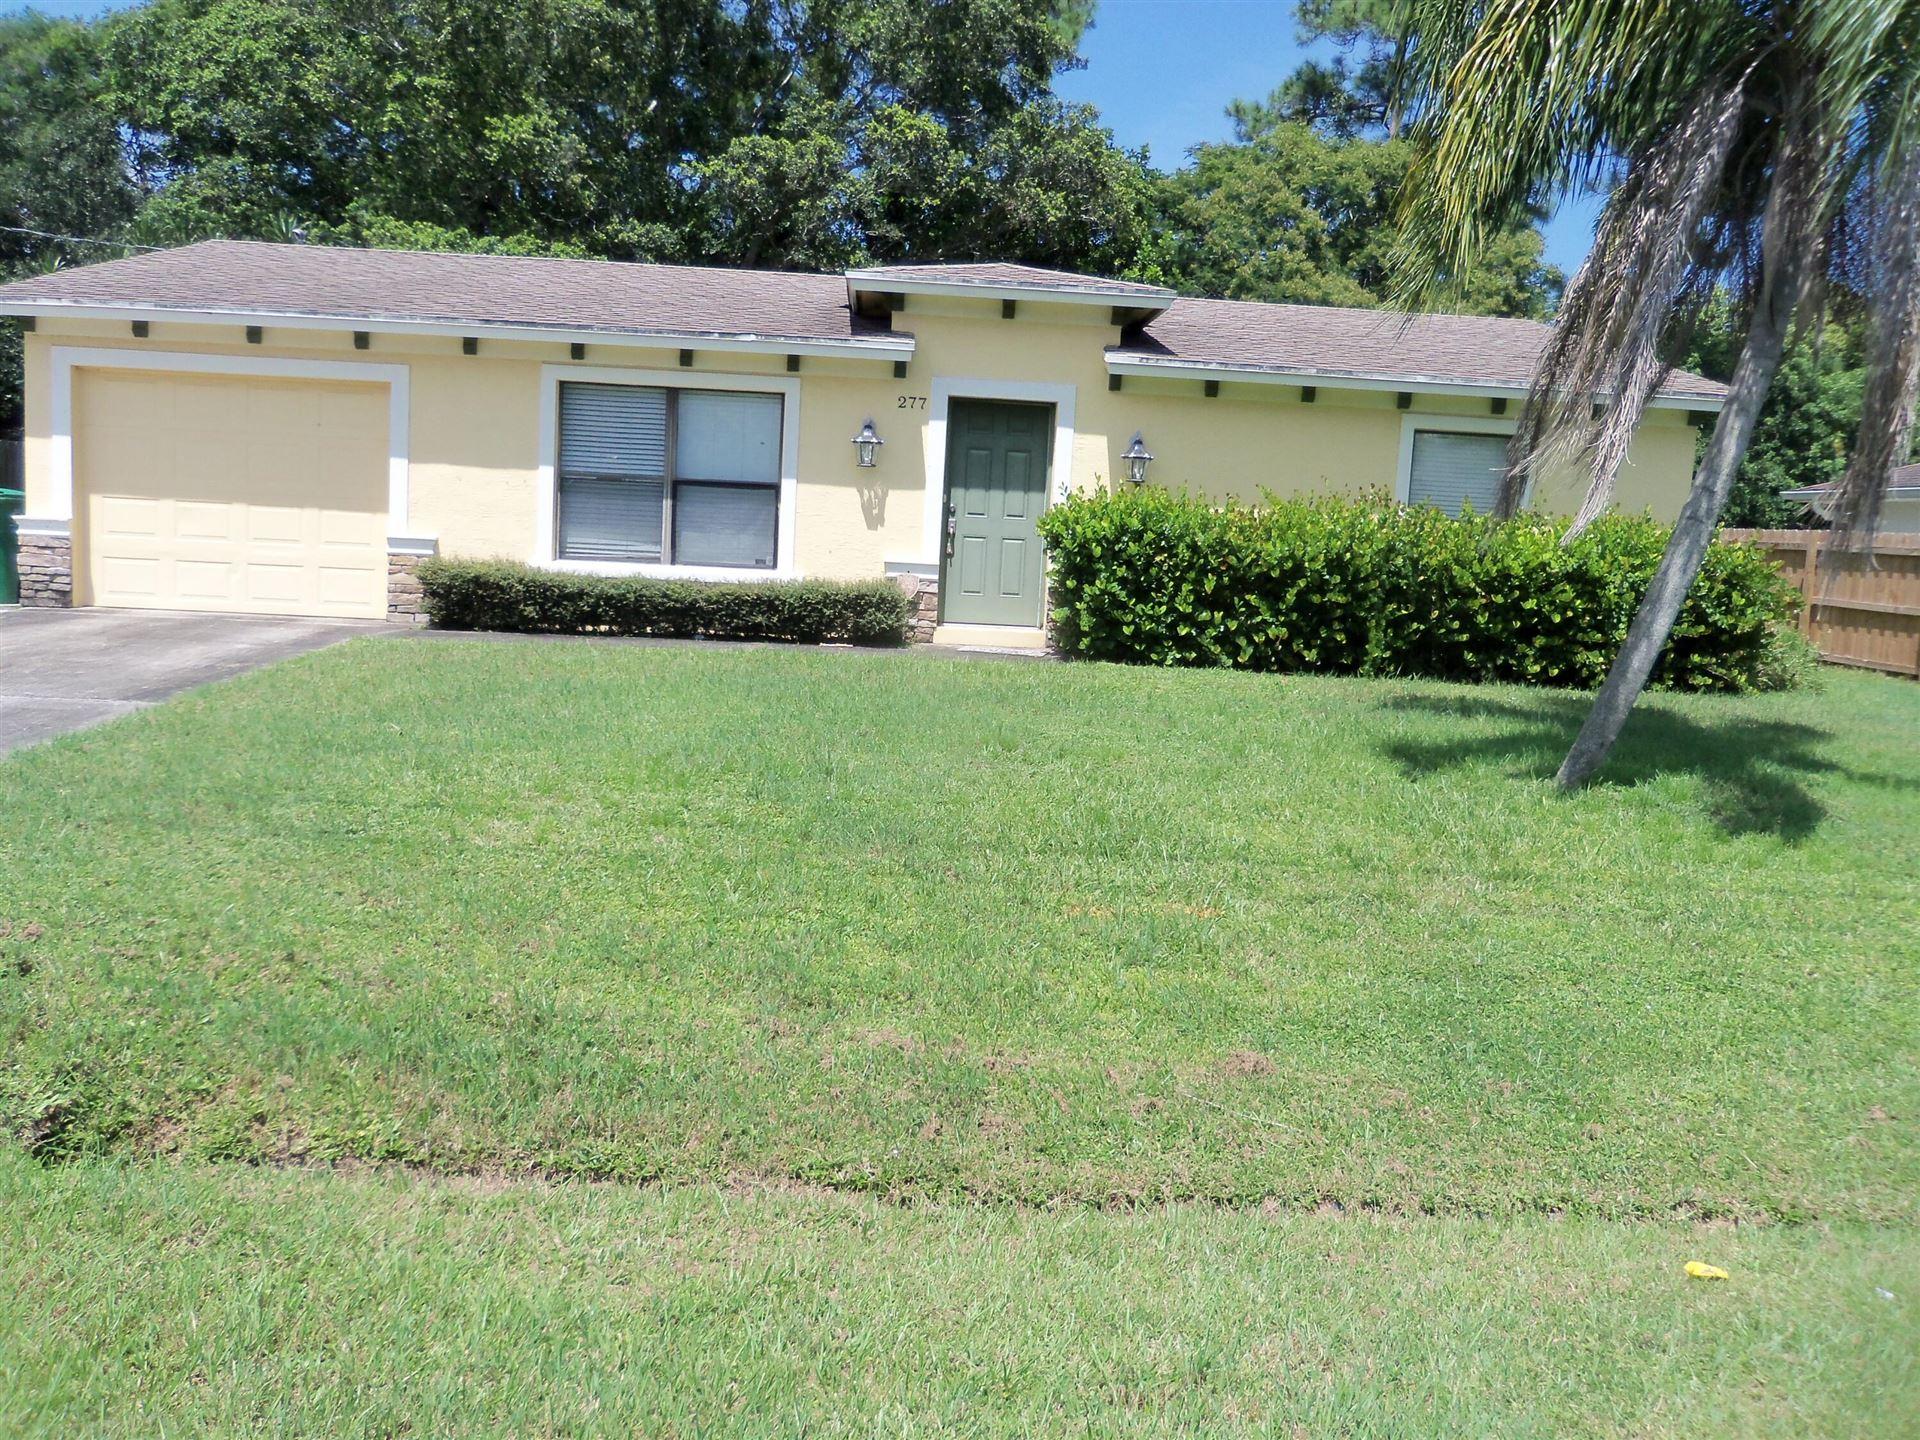 277 SE Verada Avenue, Port Saint Lucie, FL 34983 - MLS#: RX-10744085